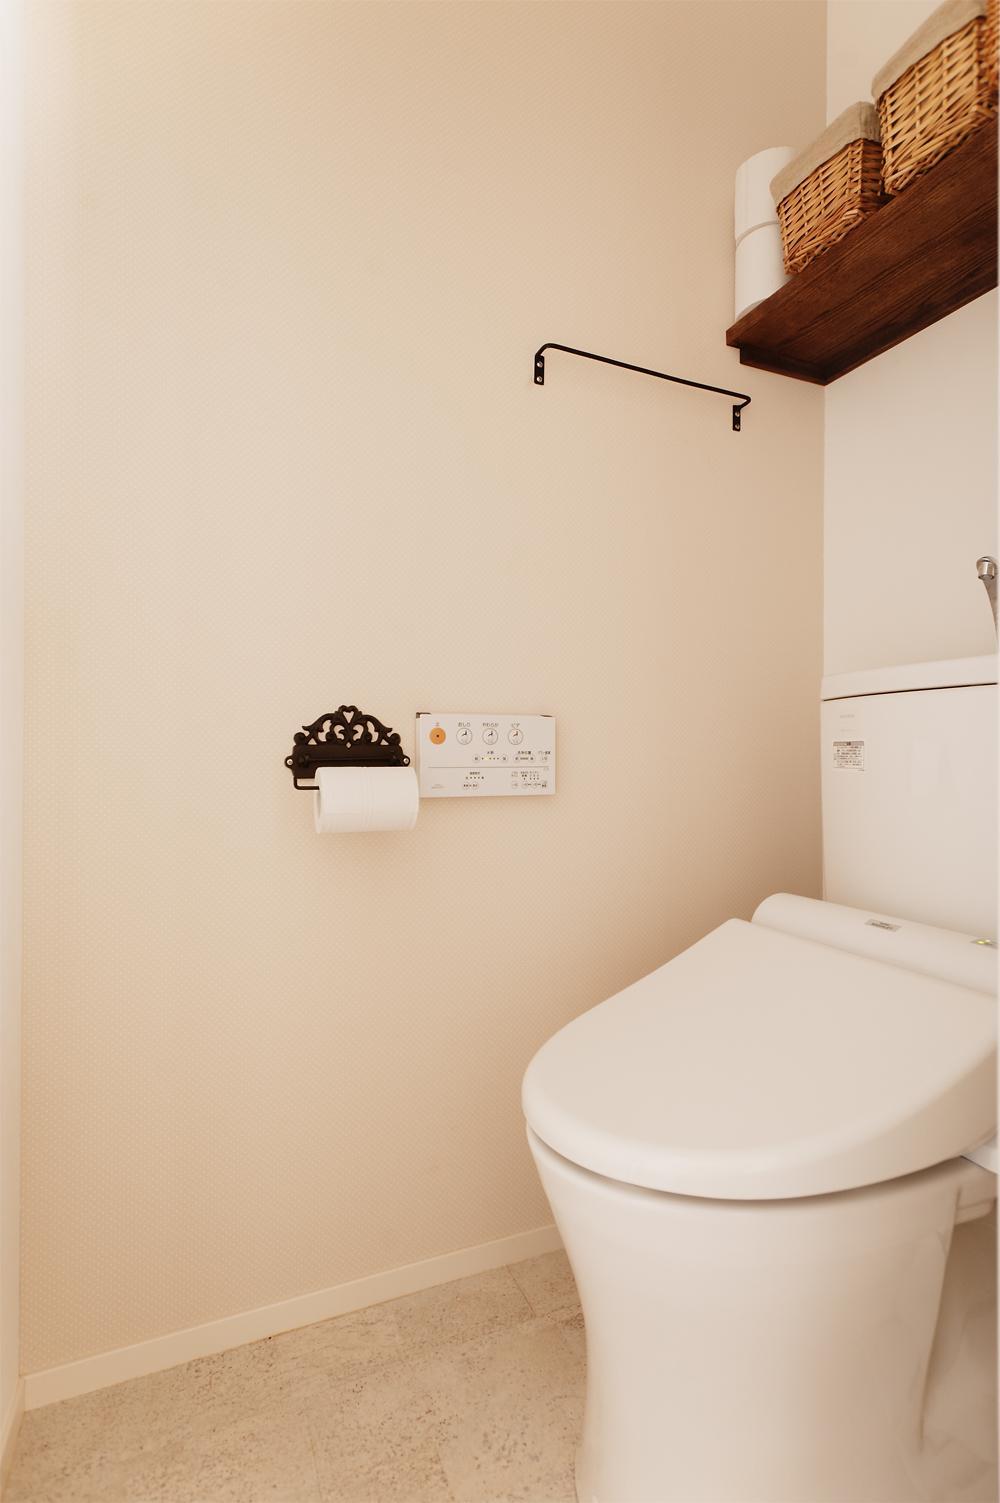 T邸・家族のくらしをより楽しく豊かにするとっておきの家の部屋 シンプルなトイレ空間